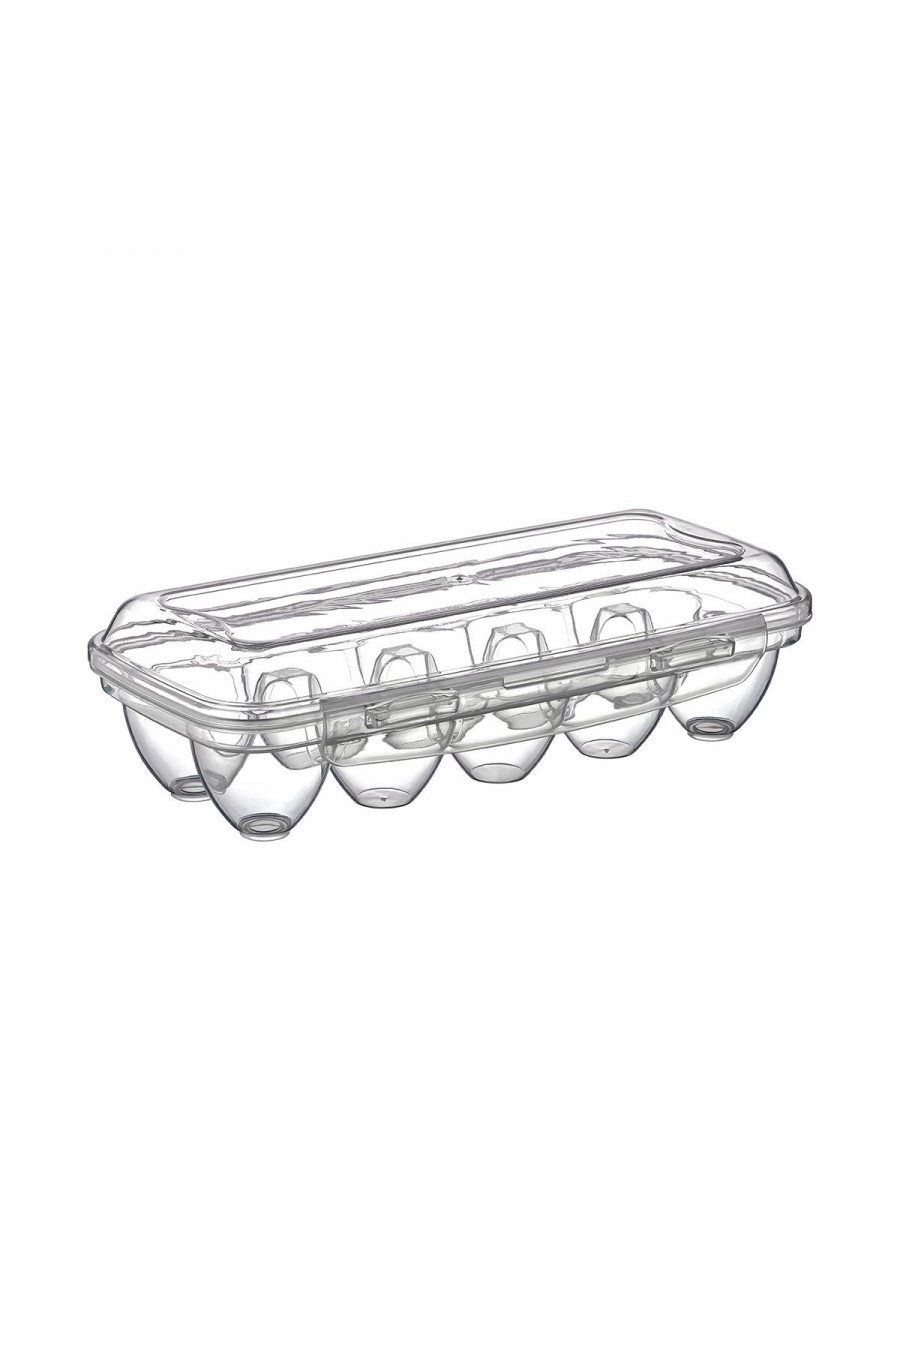 PlastArt 10'lu Yumurta Kutusu | Yumurta Saklama Kabı